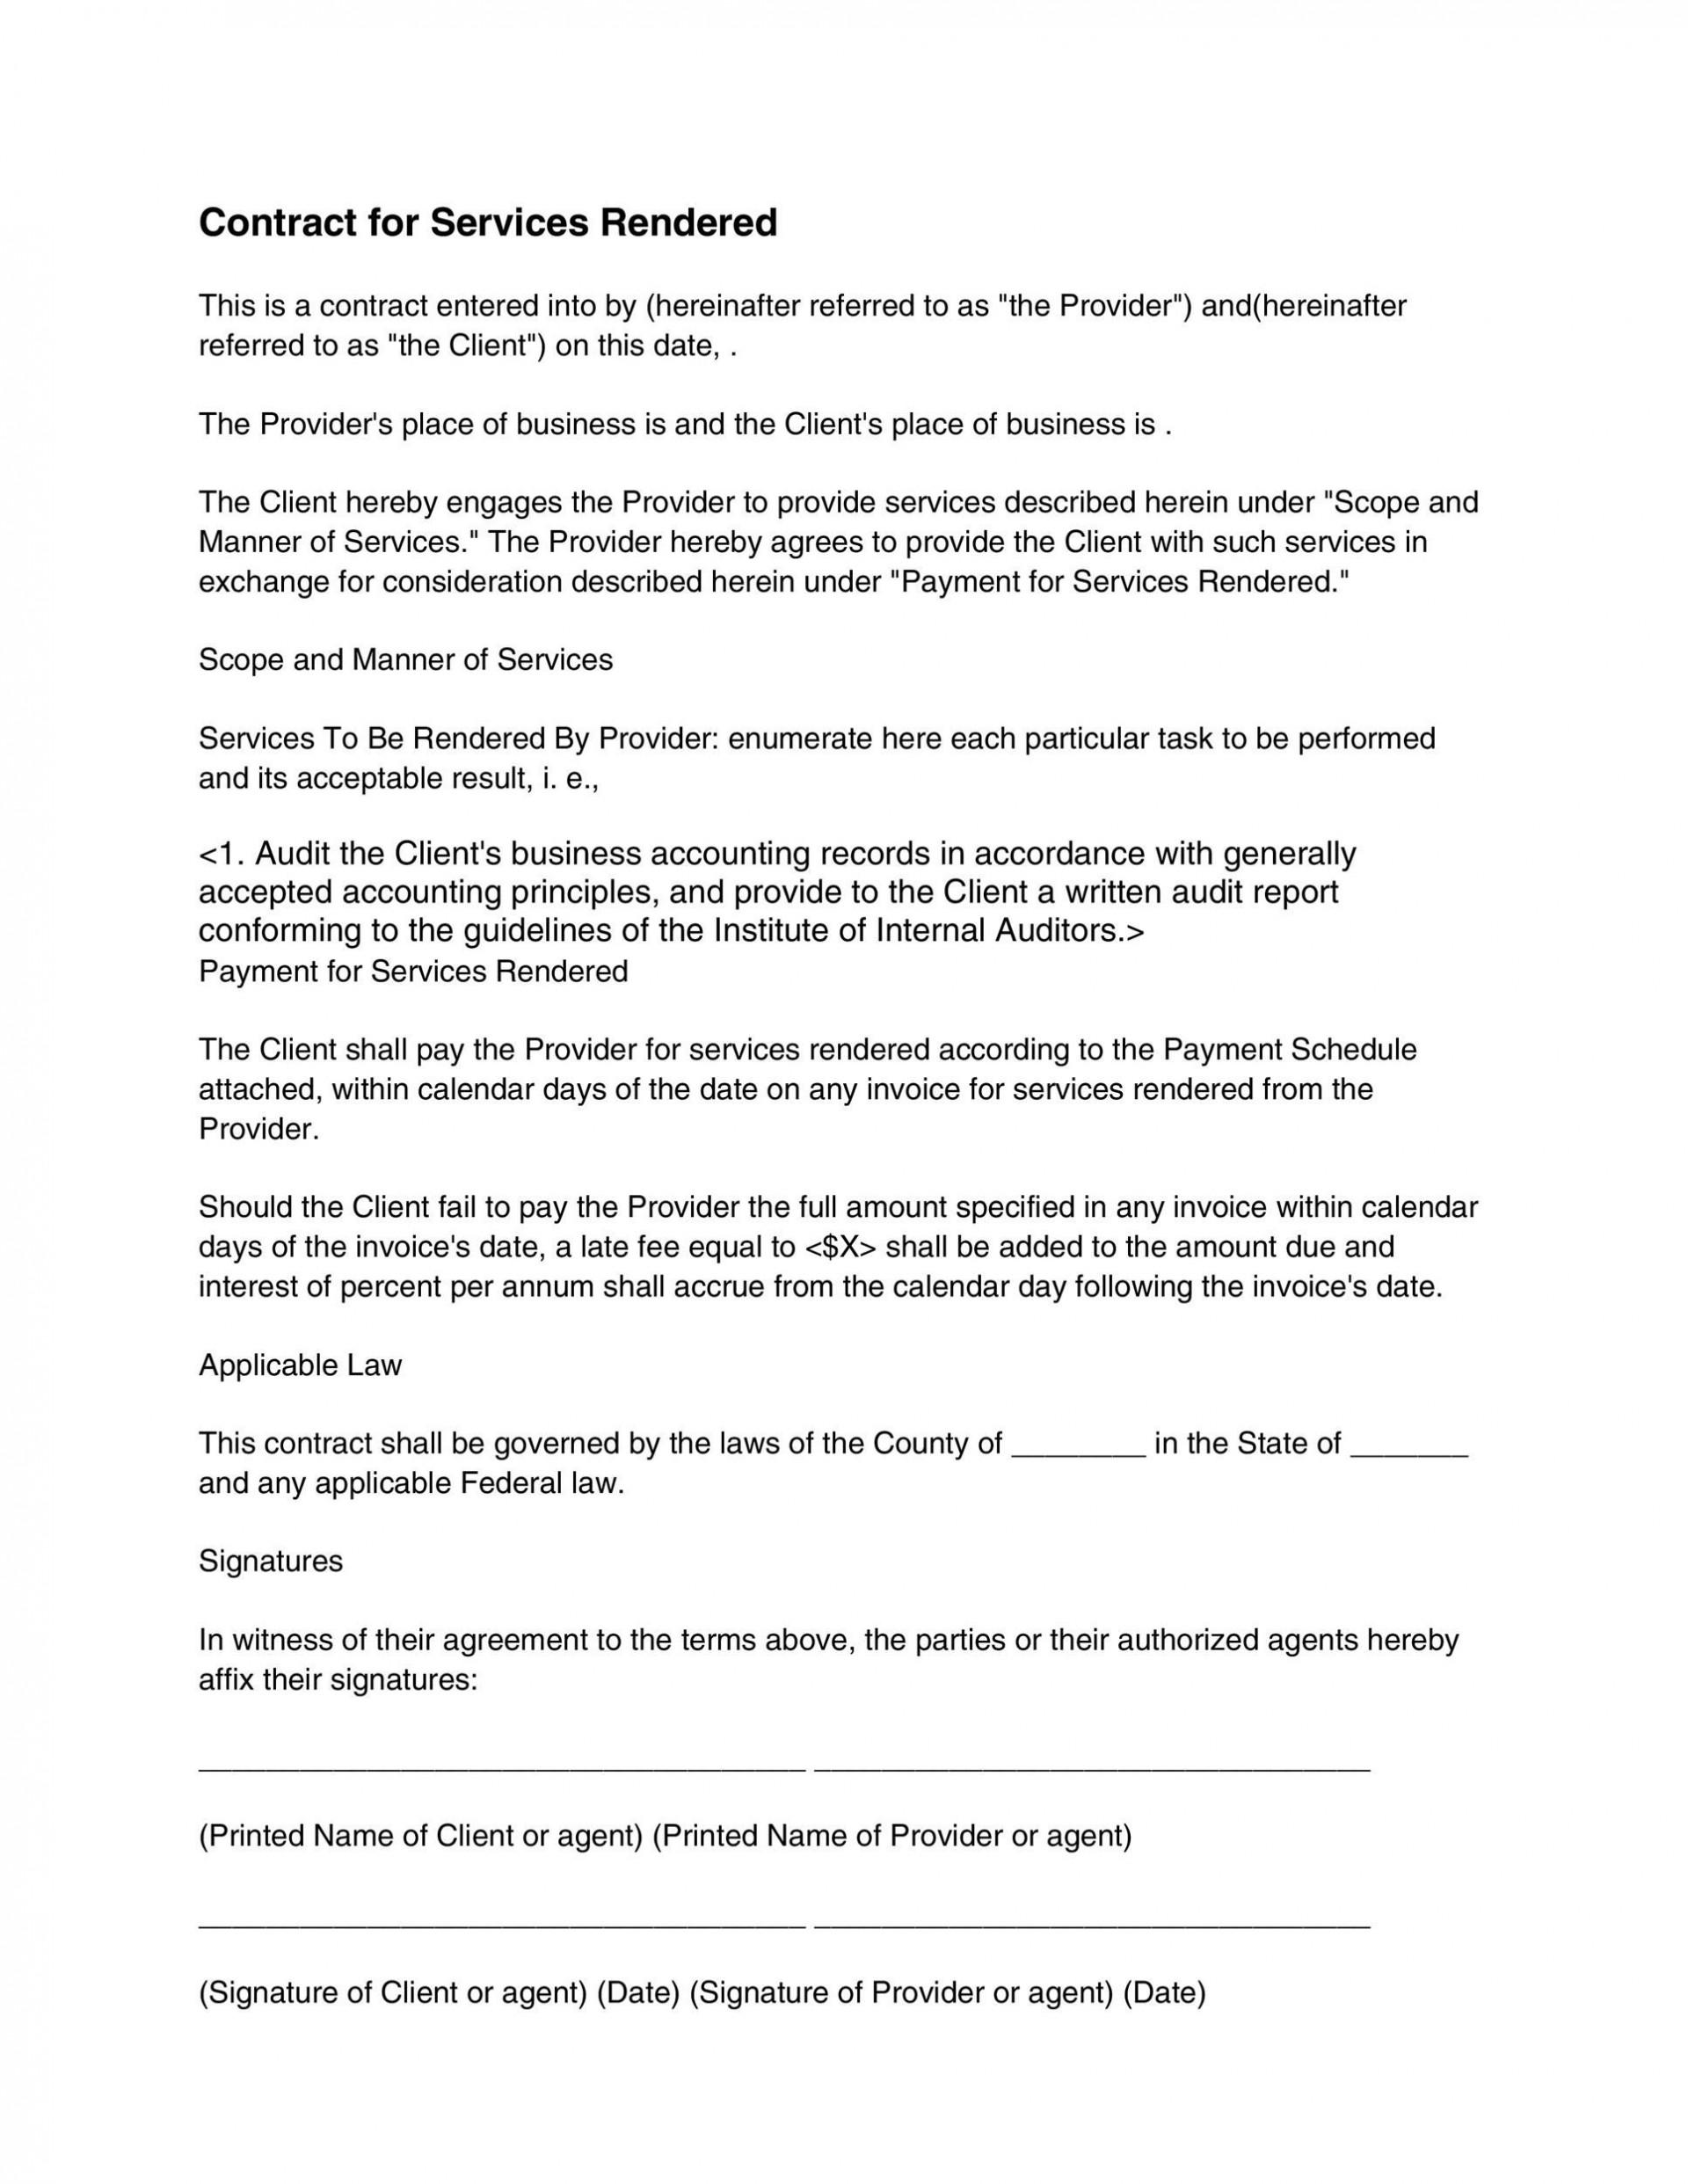 004 Beautiful Legally Binding Contract Template Design  Australia Term 3 Example Sample1920